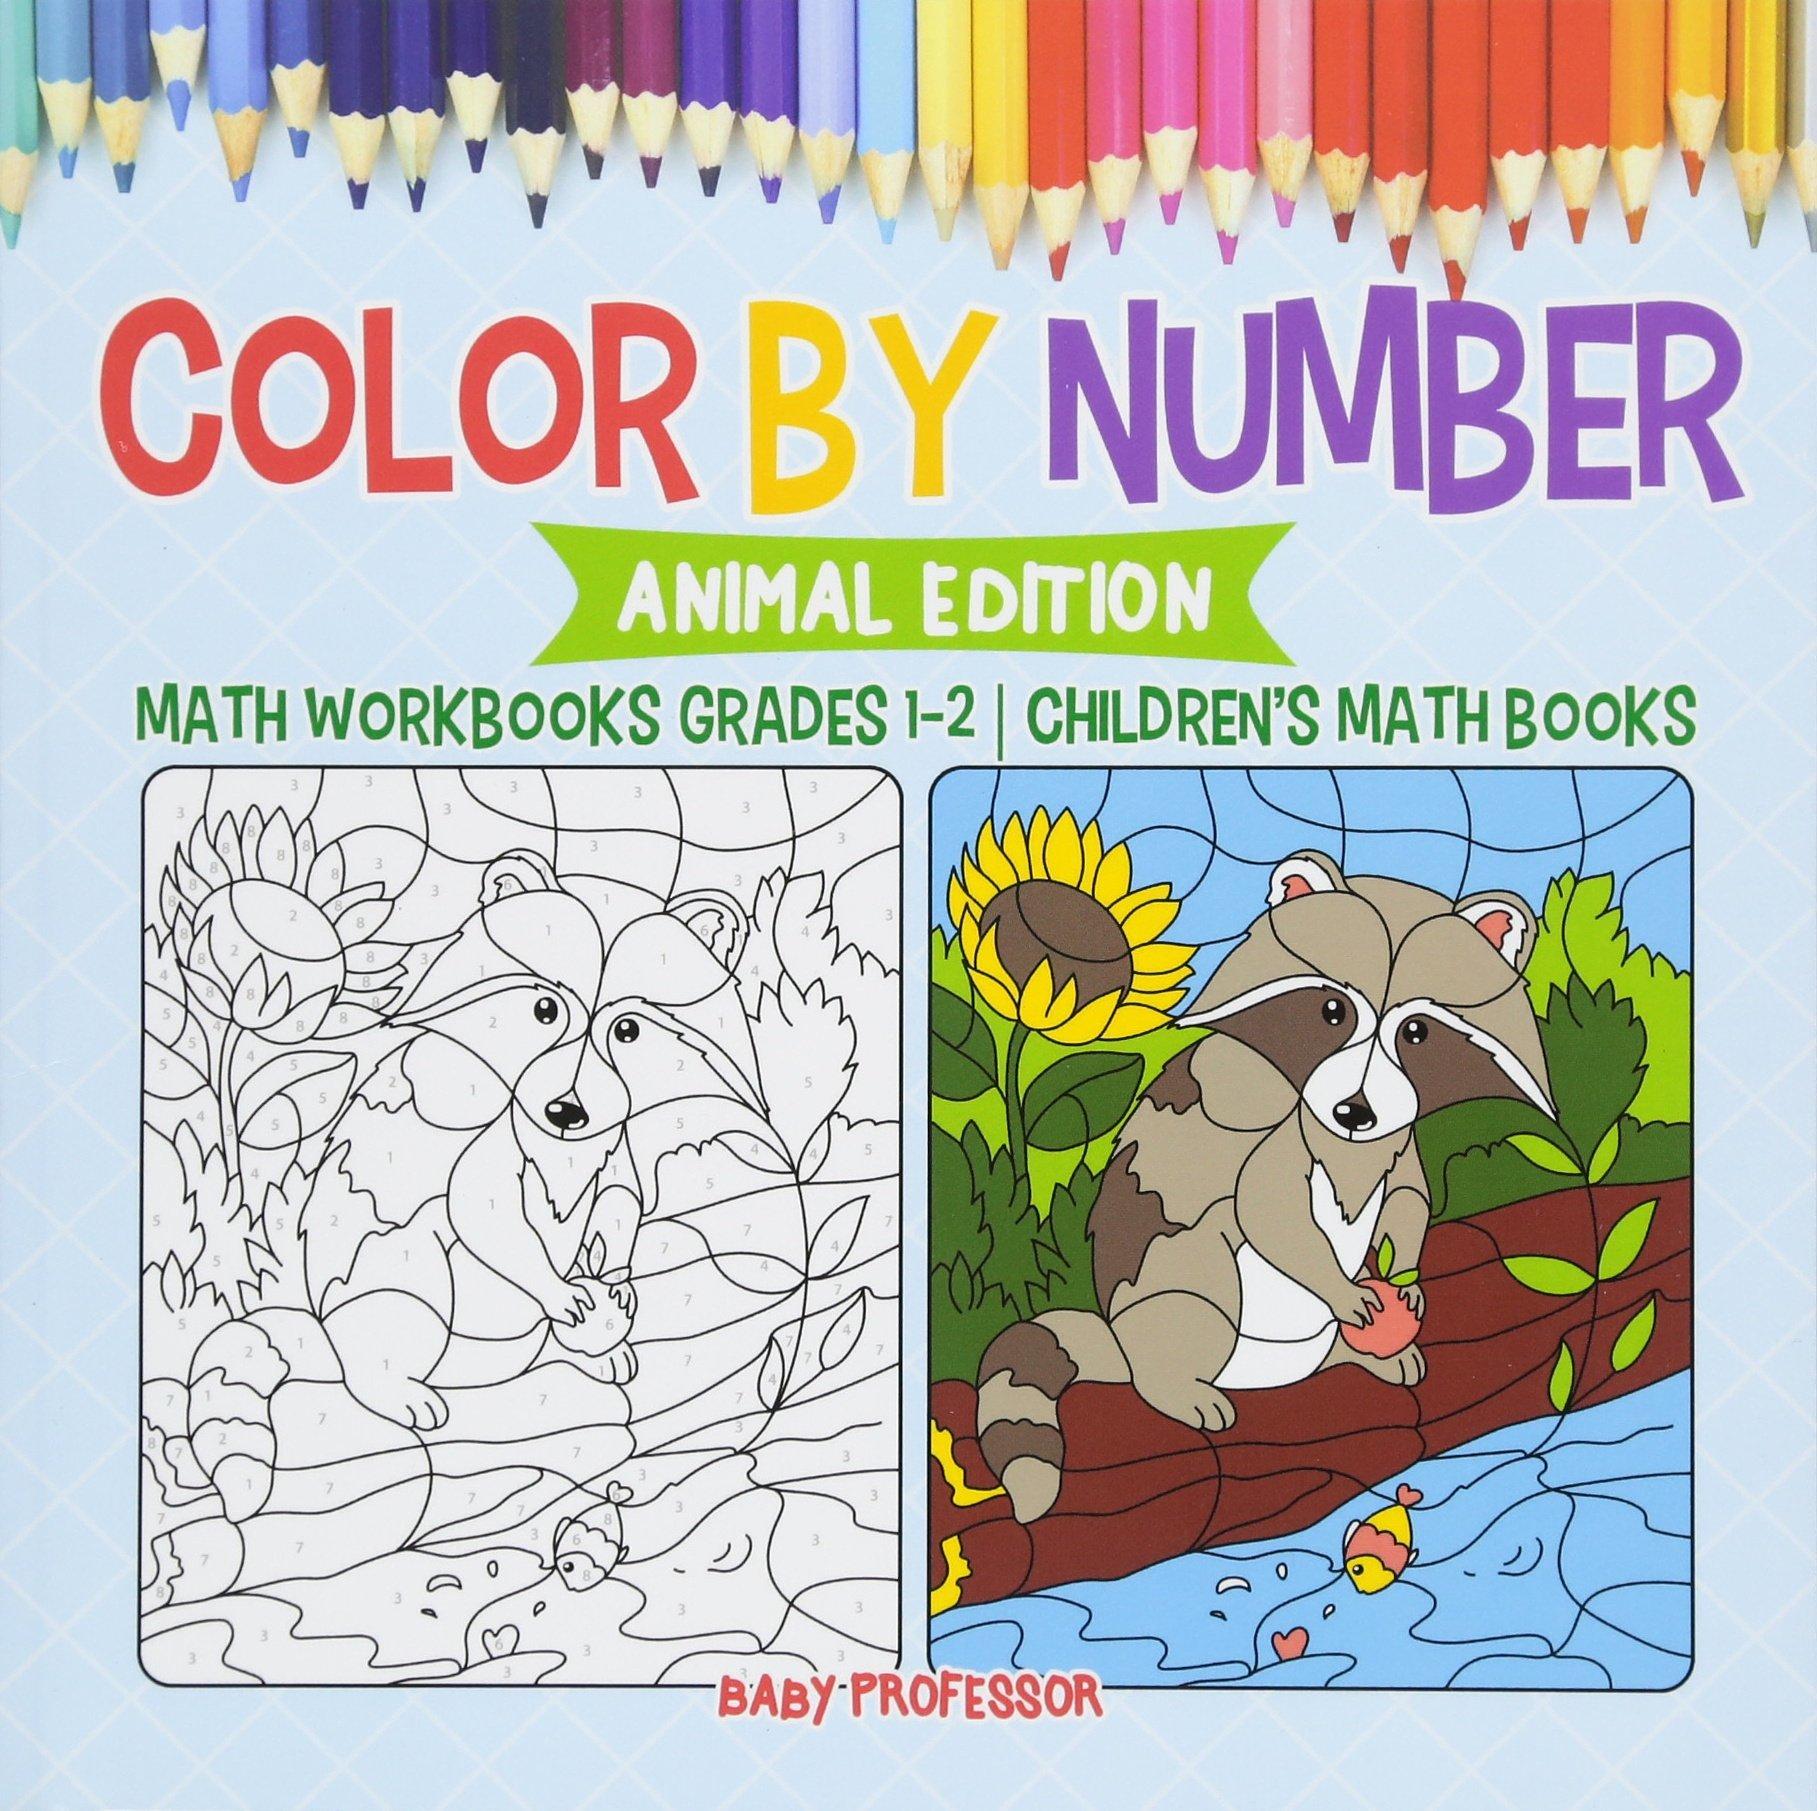 Download Color by Number : Animal Edition - Math Workbooks Grades 1-2  Children's Math Books pdf